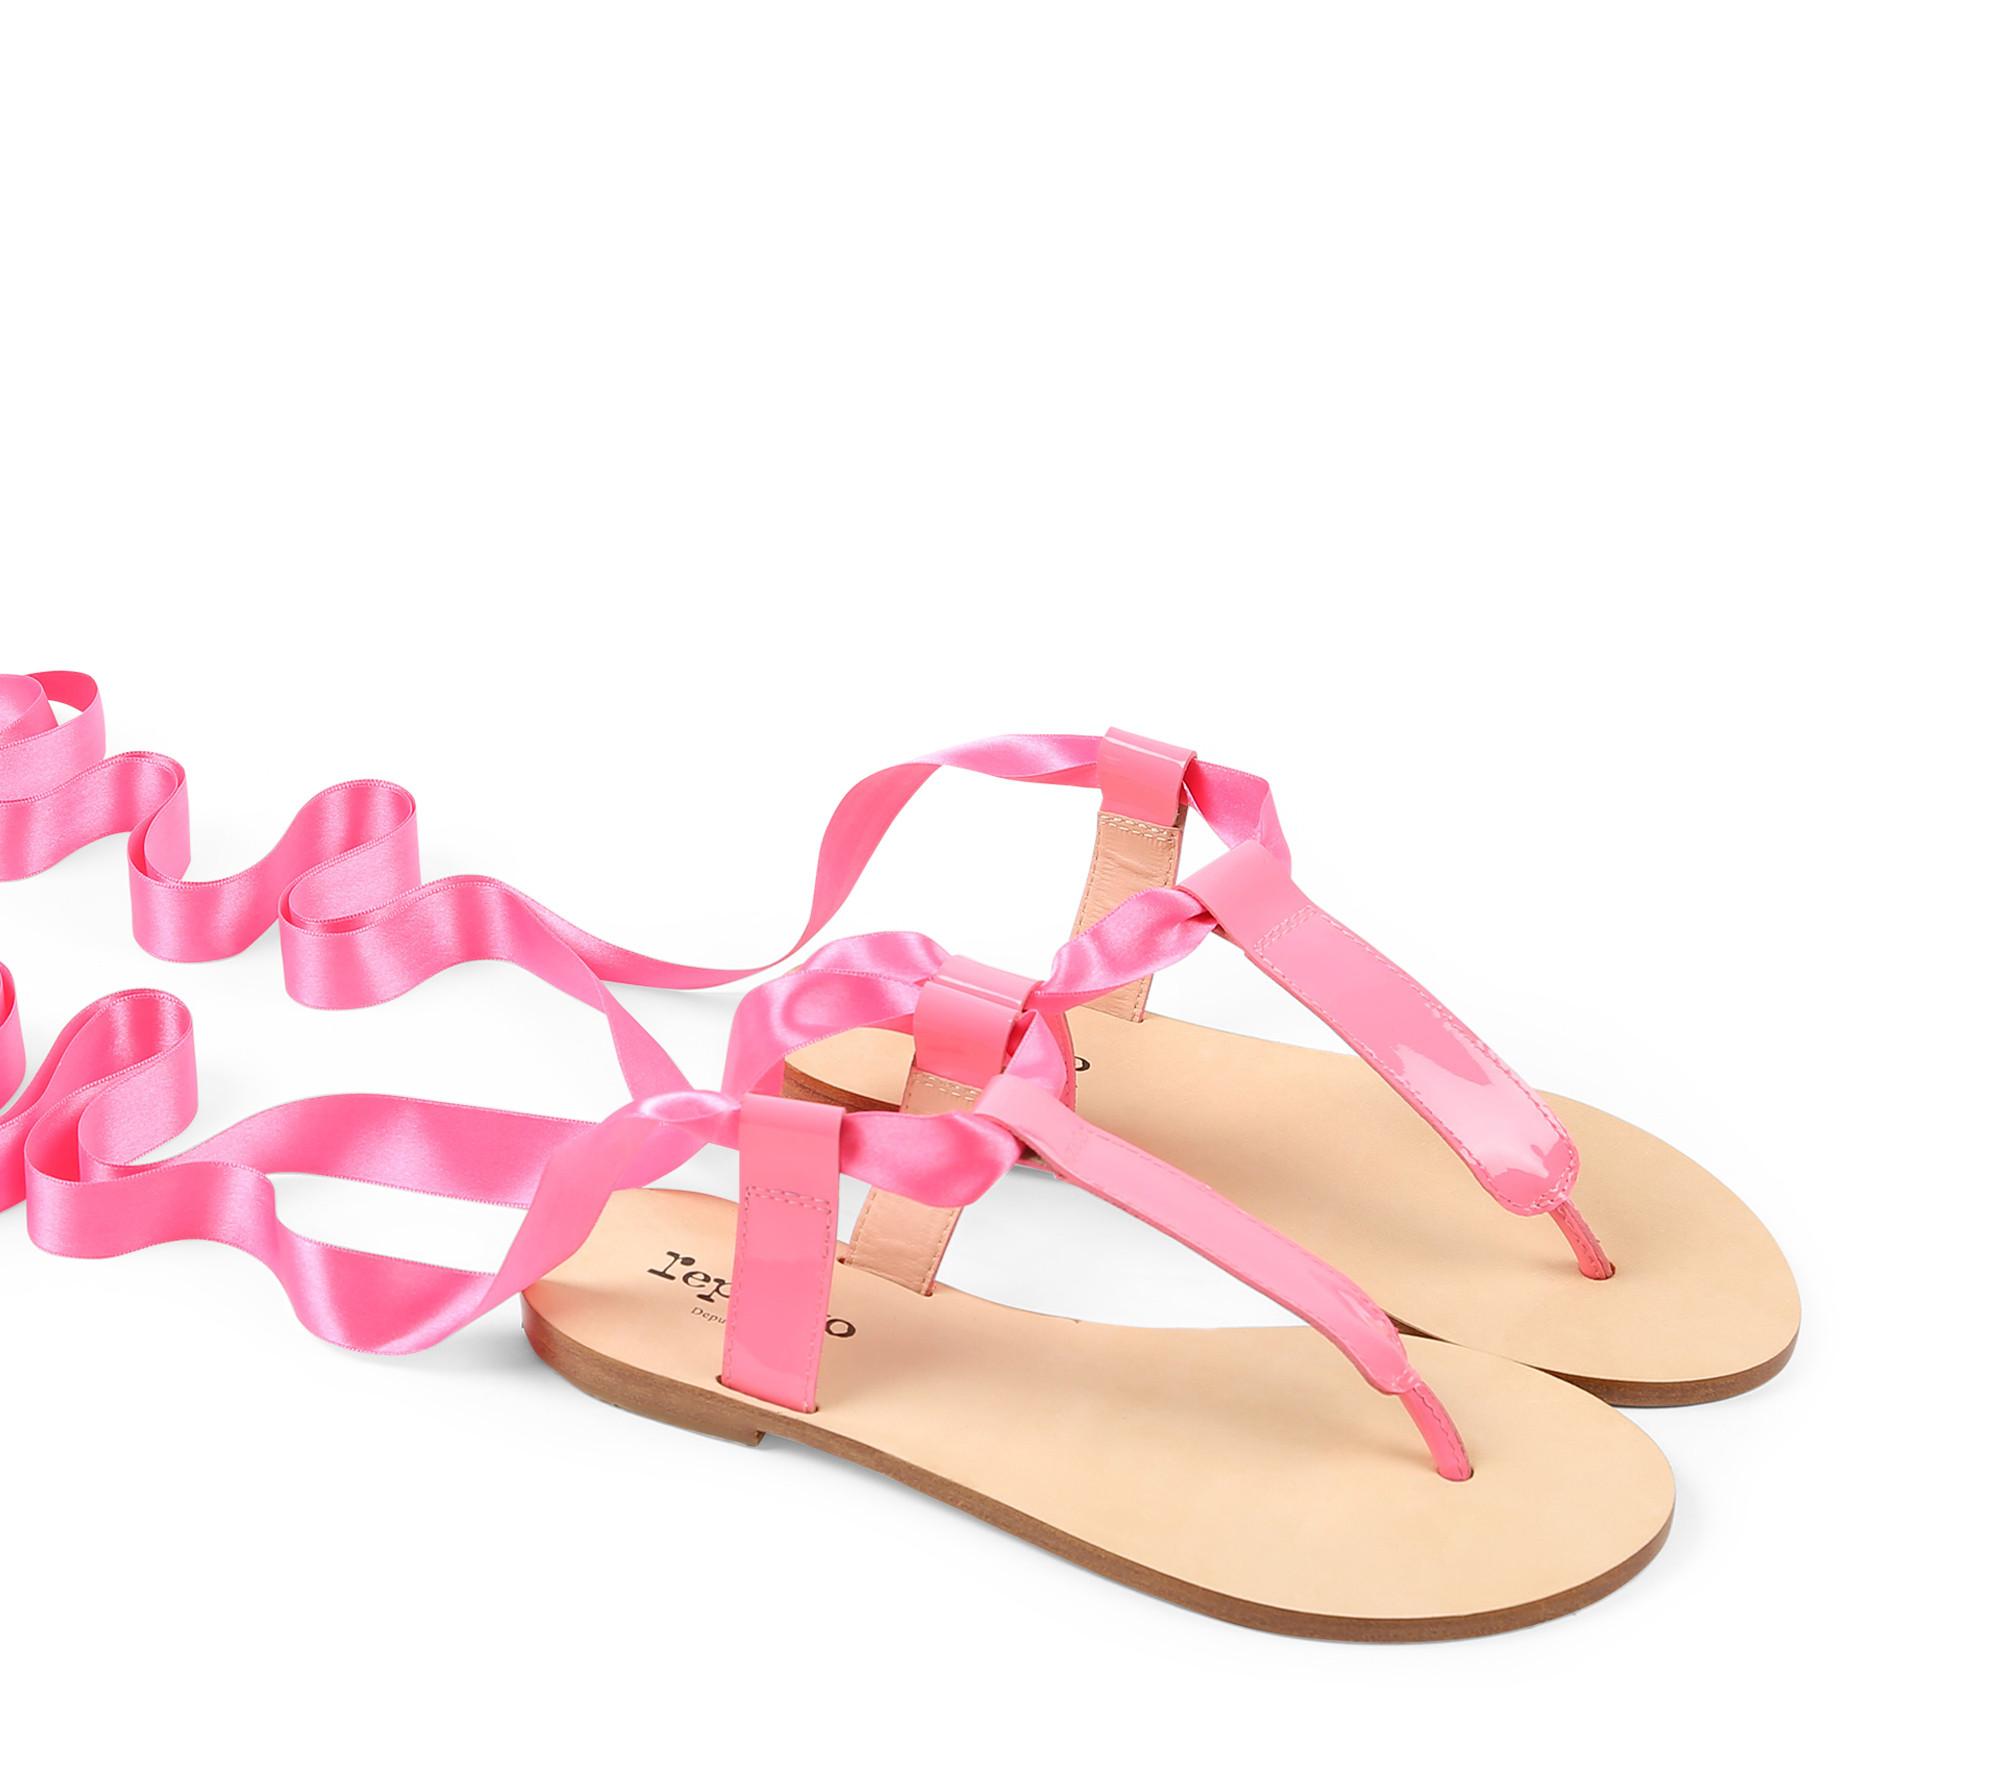 Loyd sandals